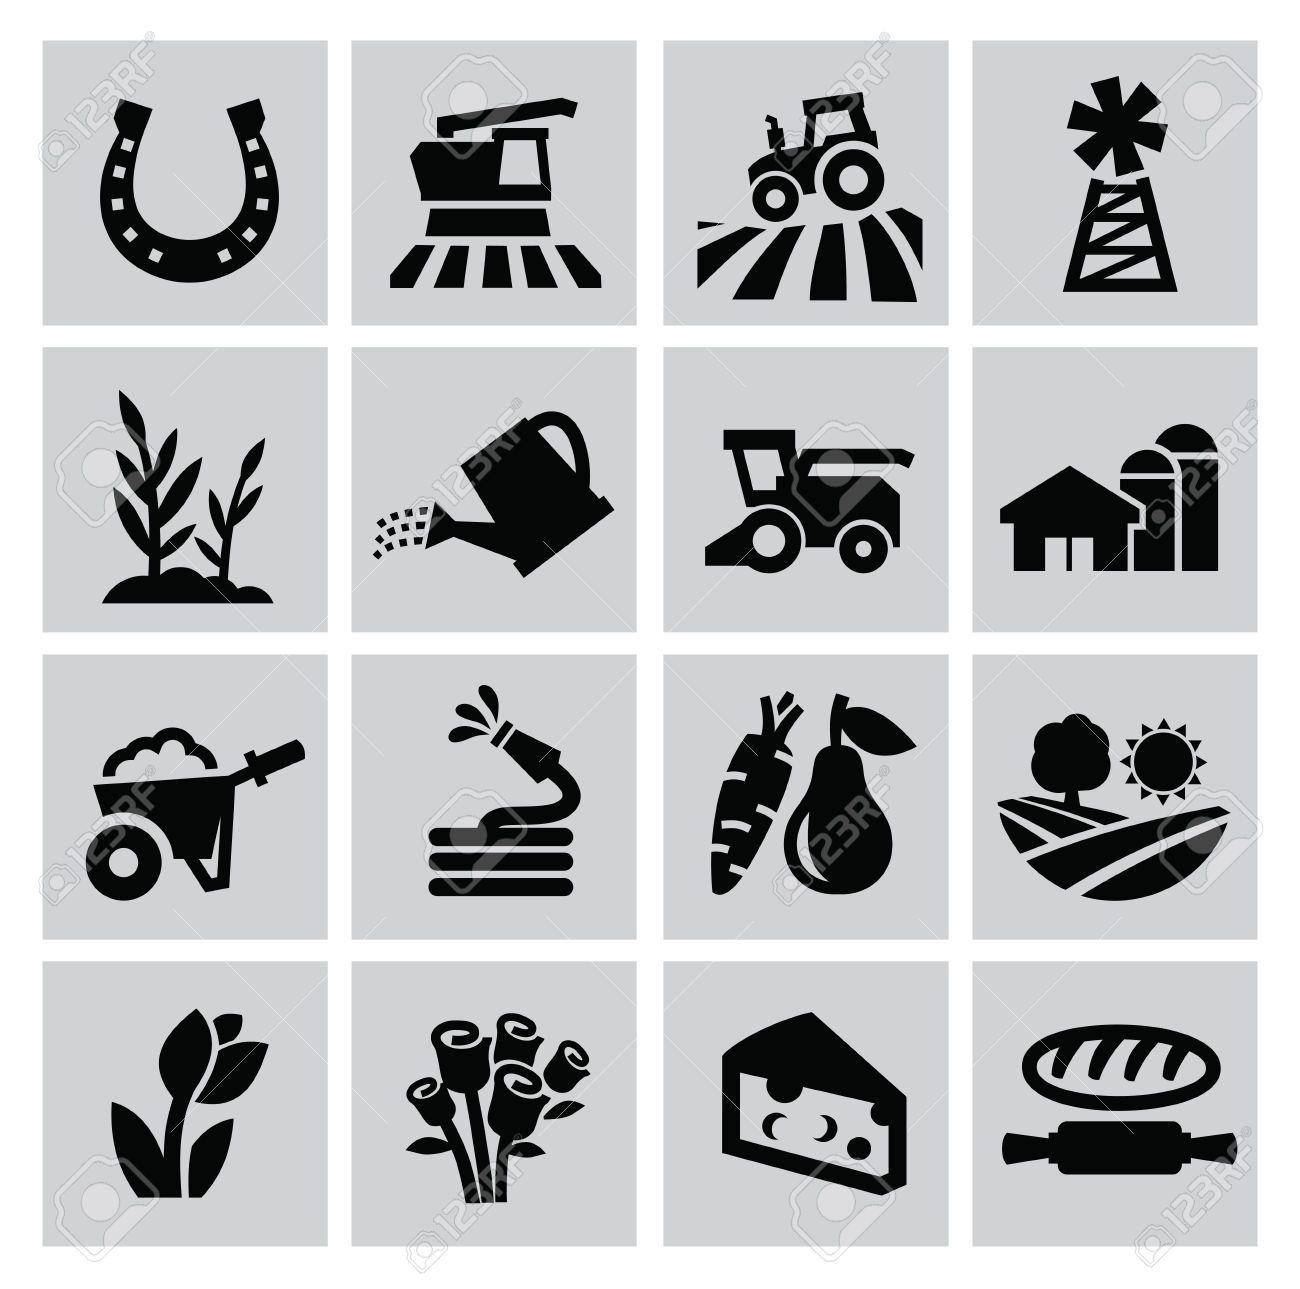 farm icon vector Google Search Vector free, Free